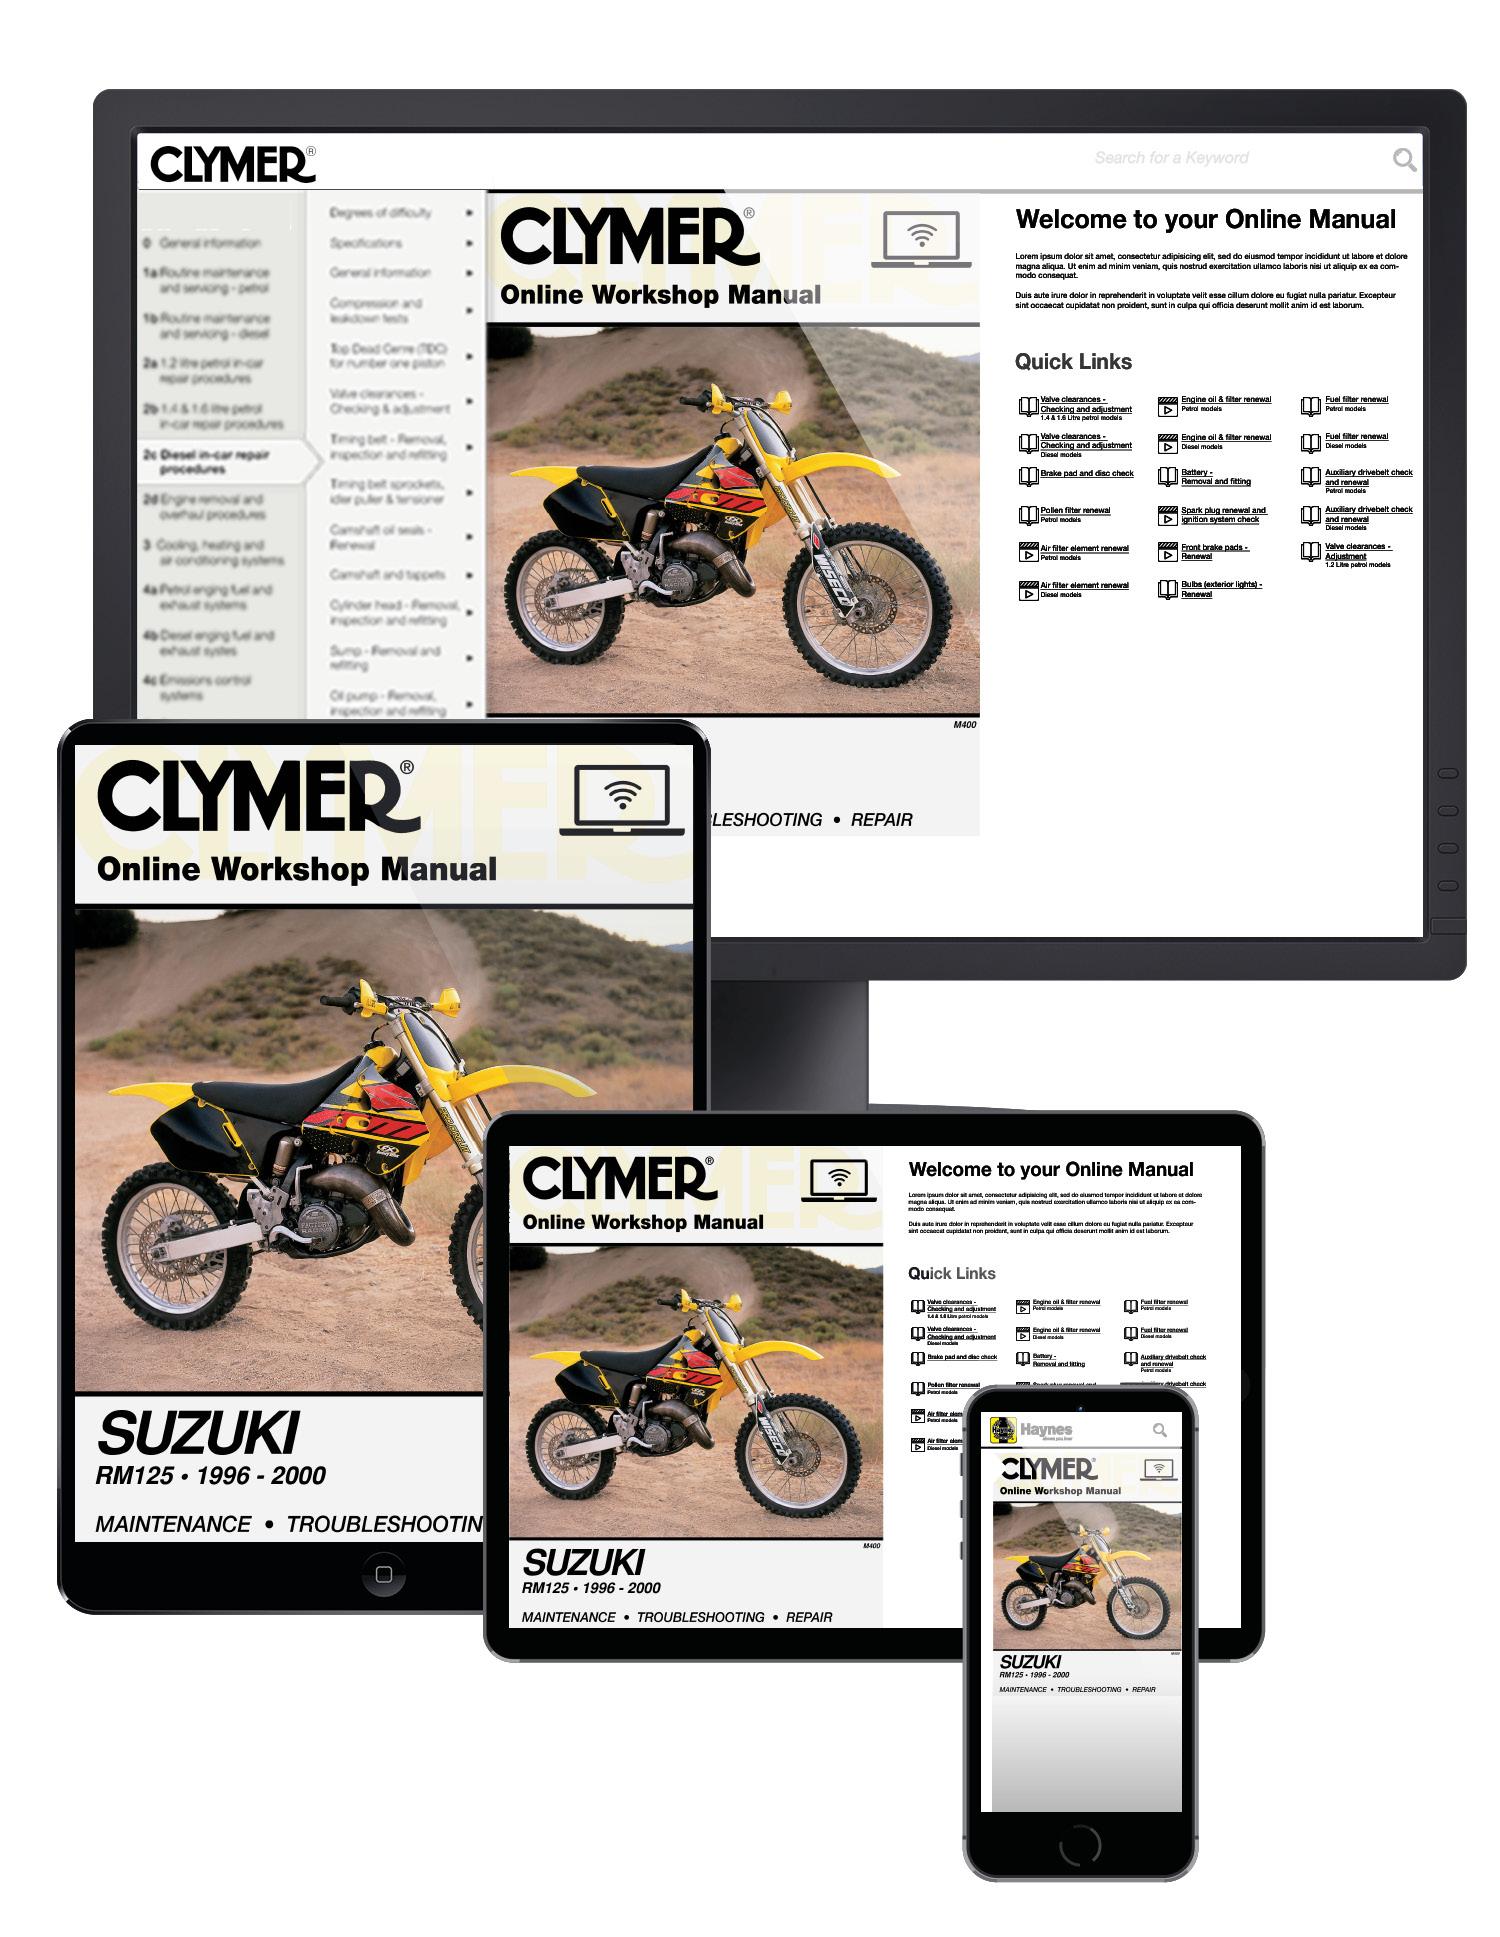 Suzuki RM125 Motorcycle (1996-2000) Service Repair Manual Online Manual